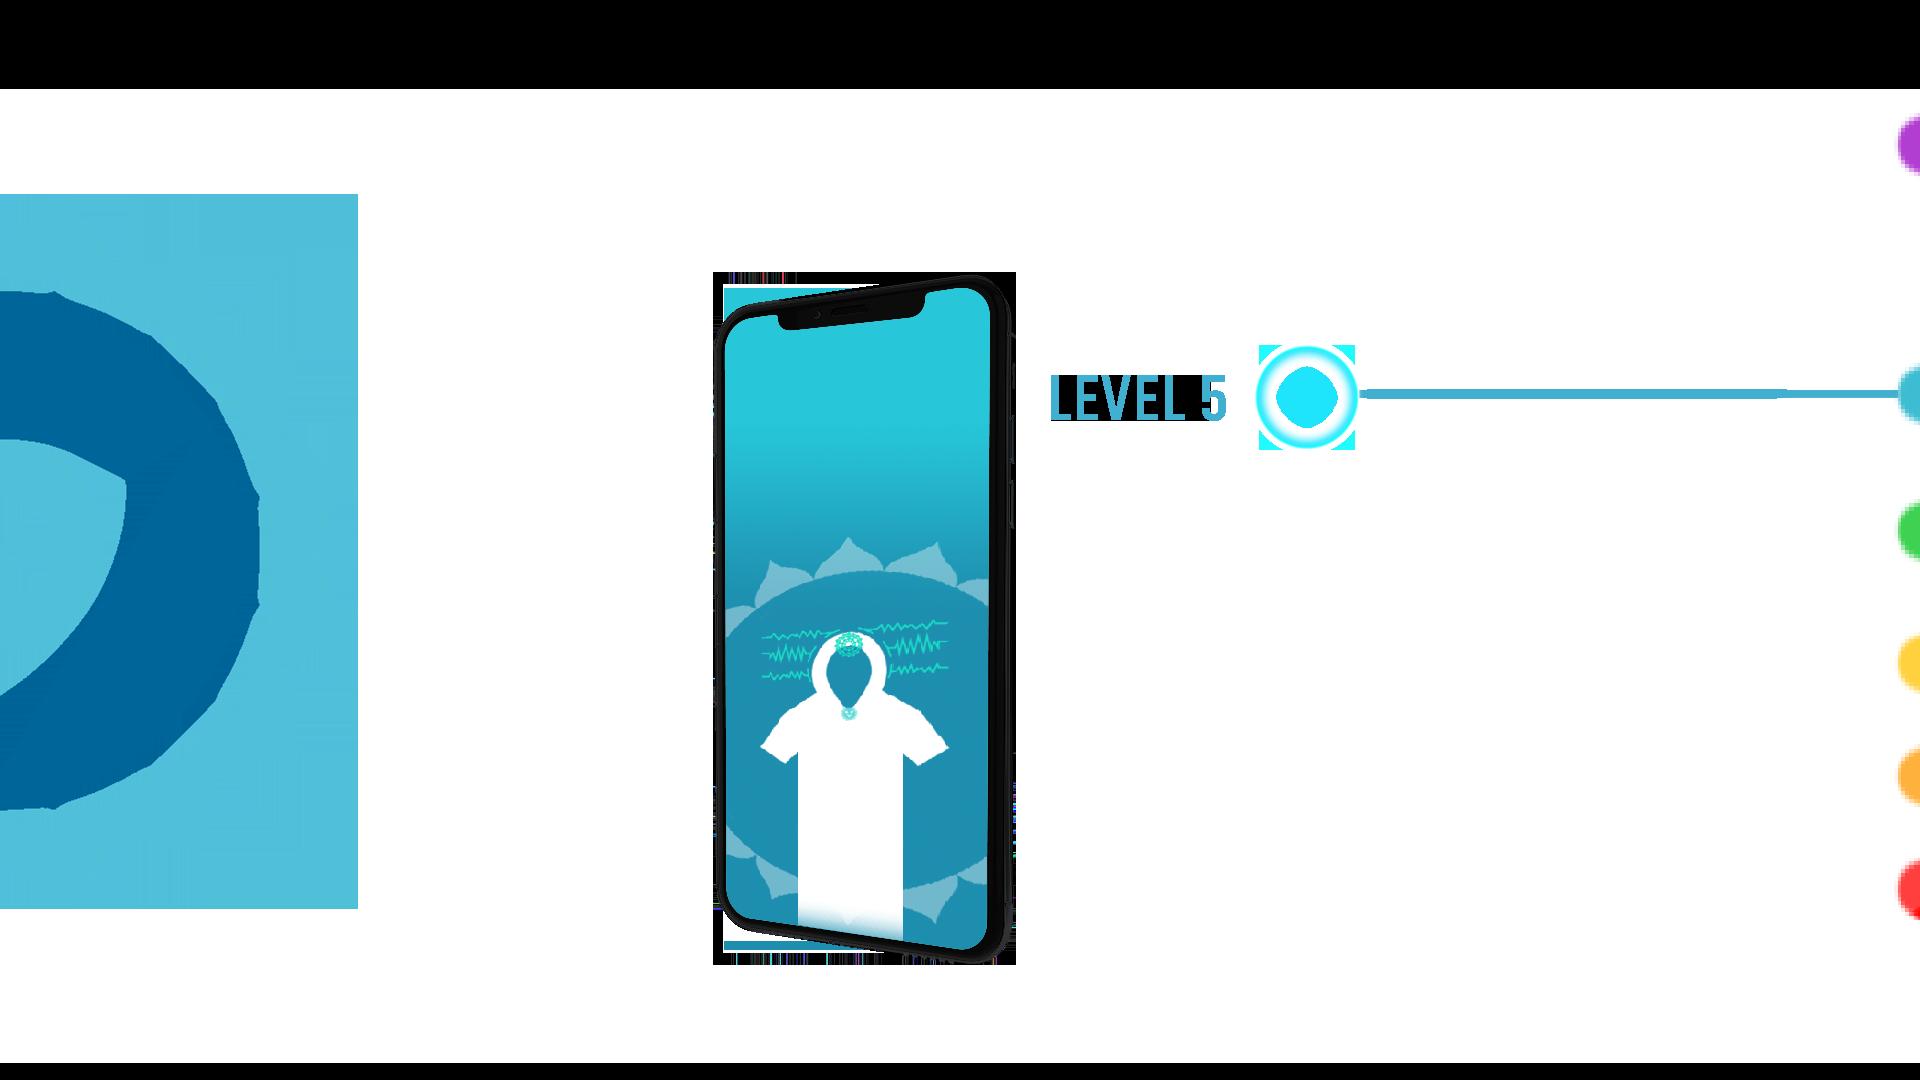 Med_Level5_Blue